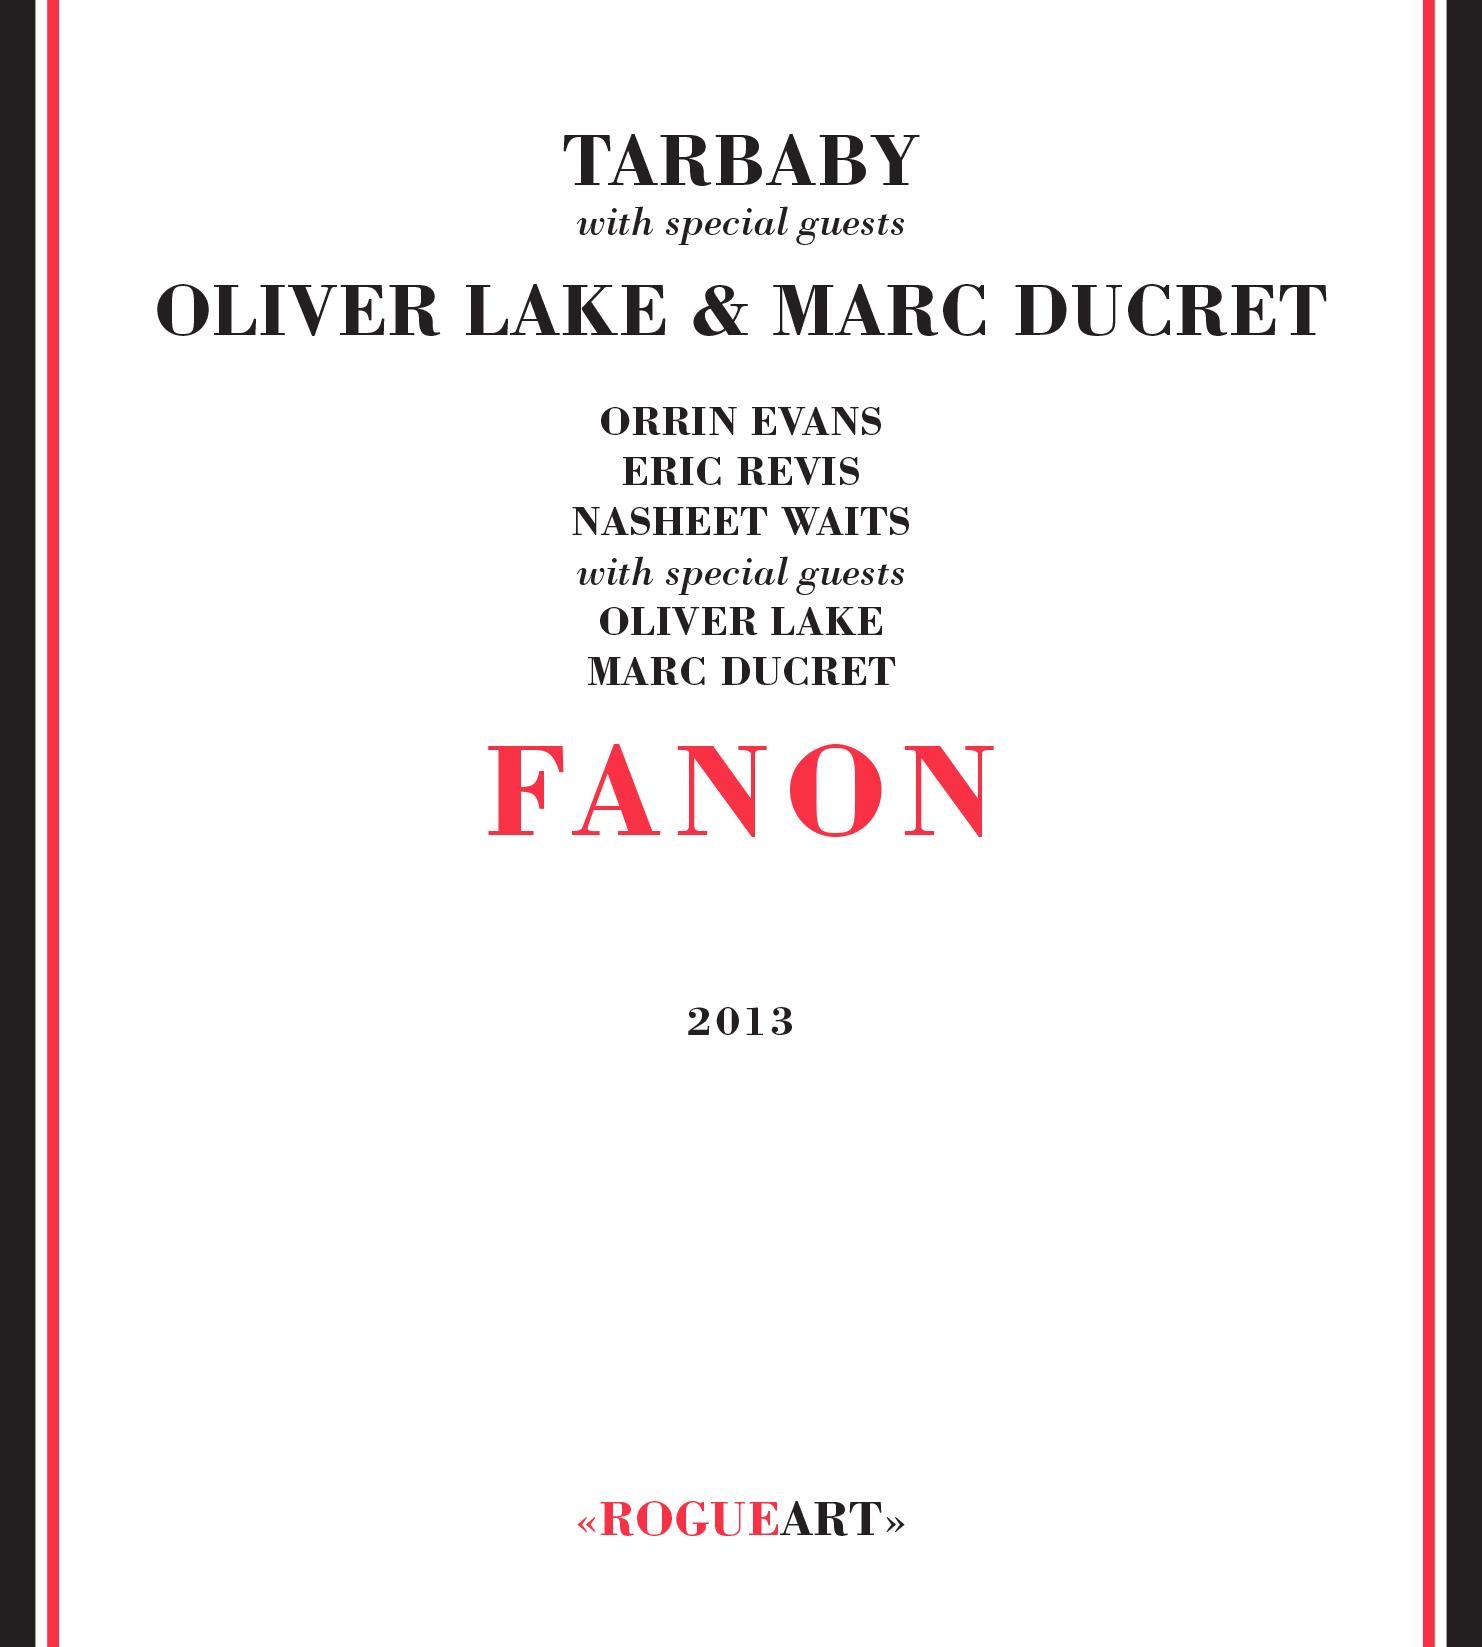 Front cover of the album FANON